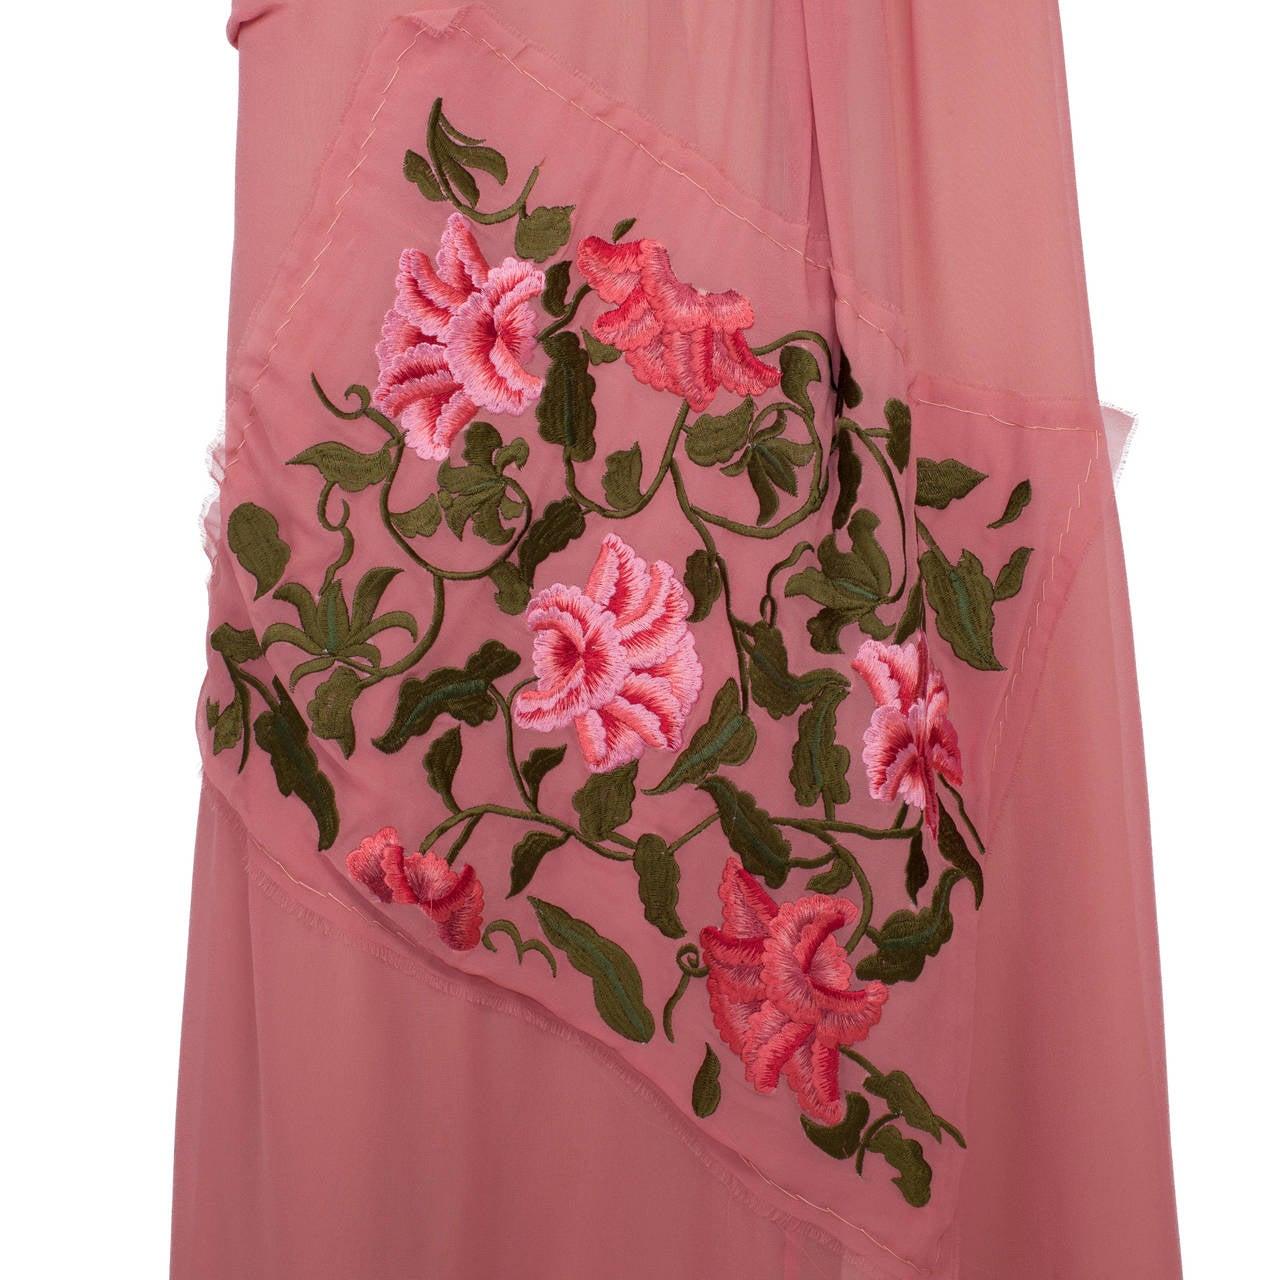 Yohji Yamamoto + Noir Pink Skirt Flower Embroidery For Sale 5